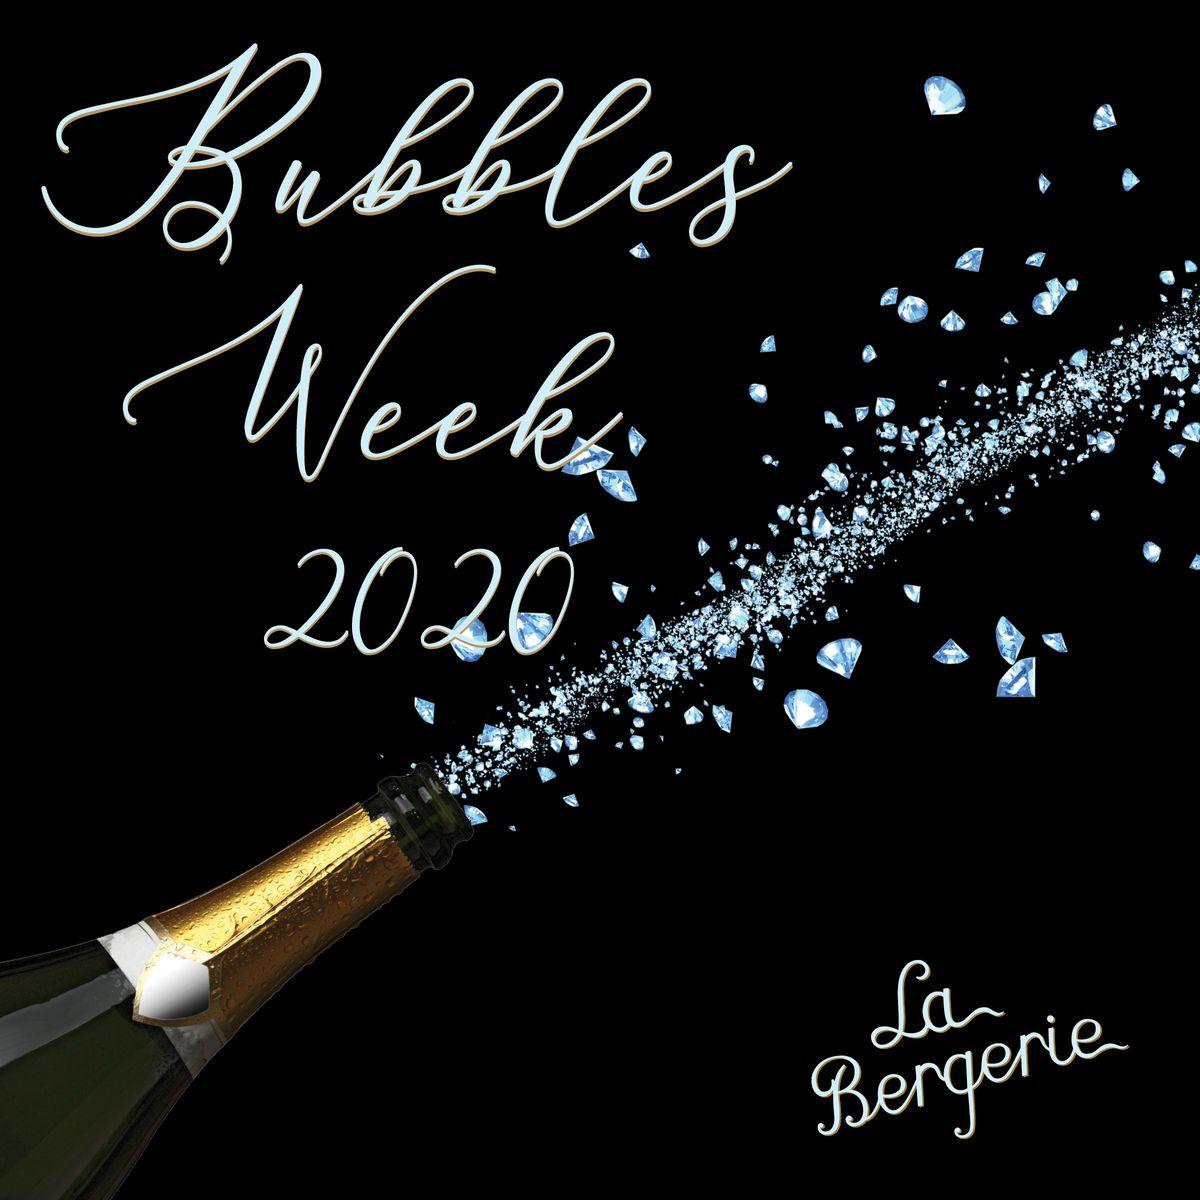 Bubbles Week square.jpg